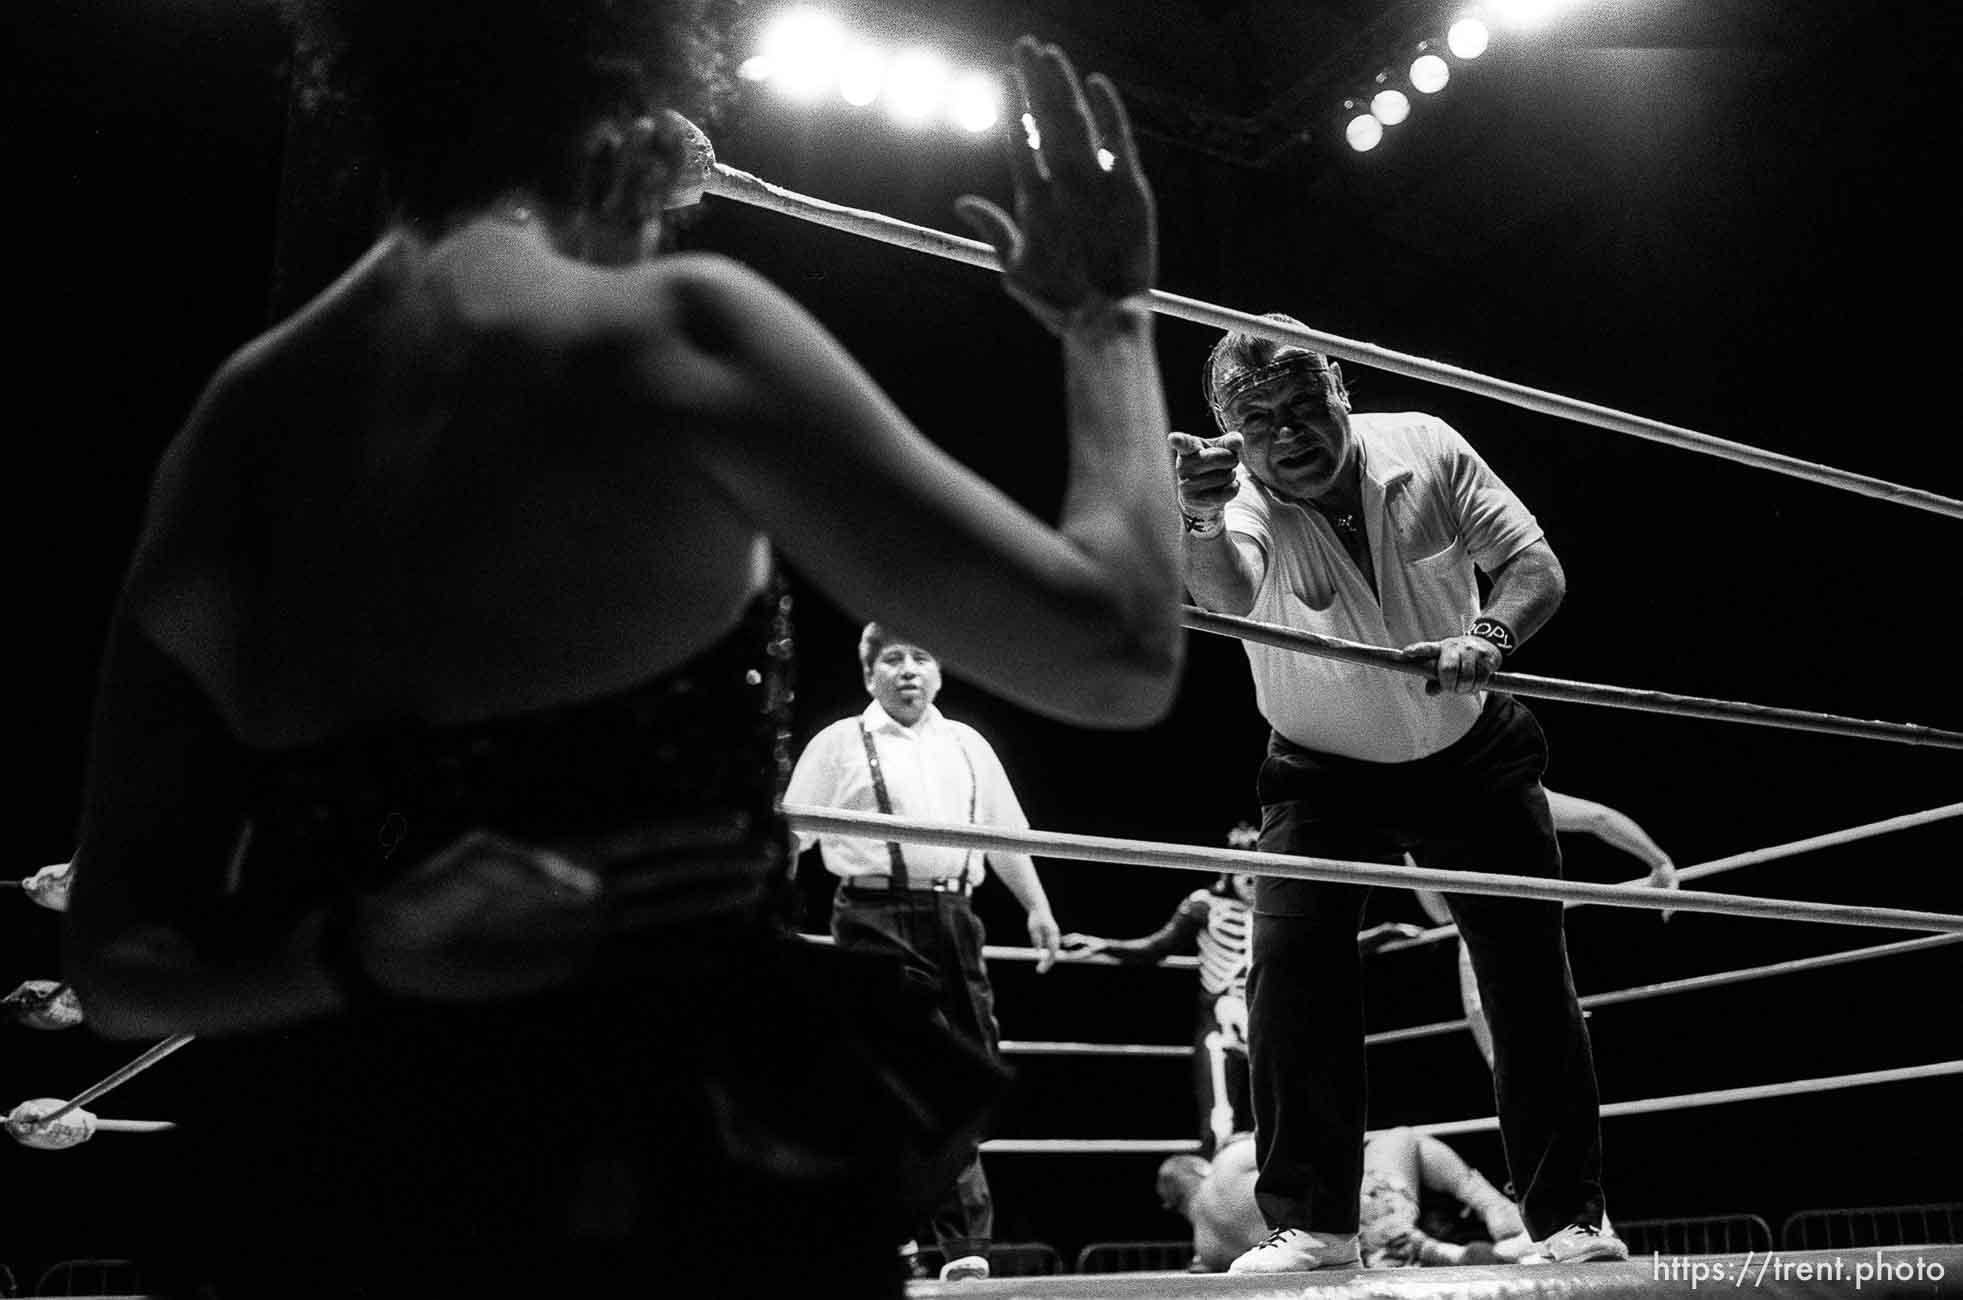 Wrestling action at Luche Libre pro-wrestling. Ref and Sensational Sherrie